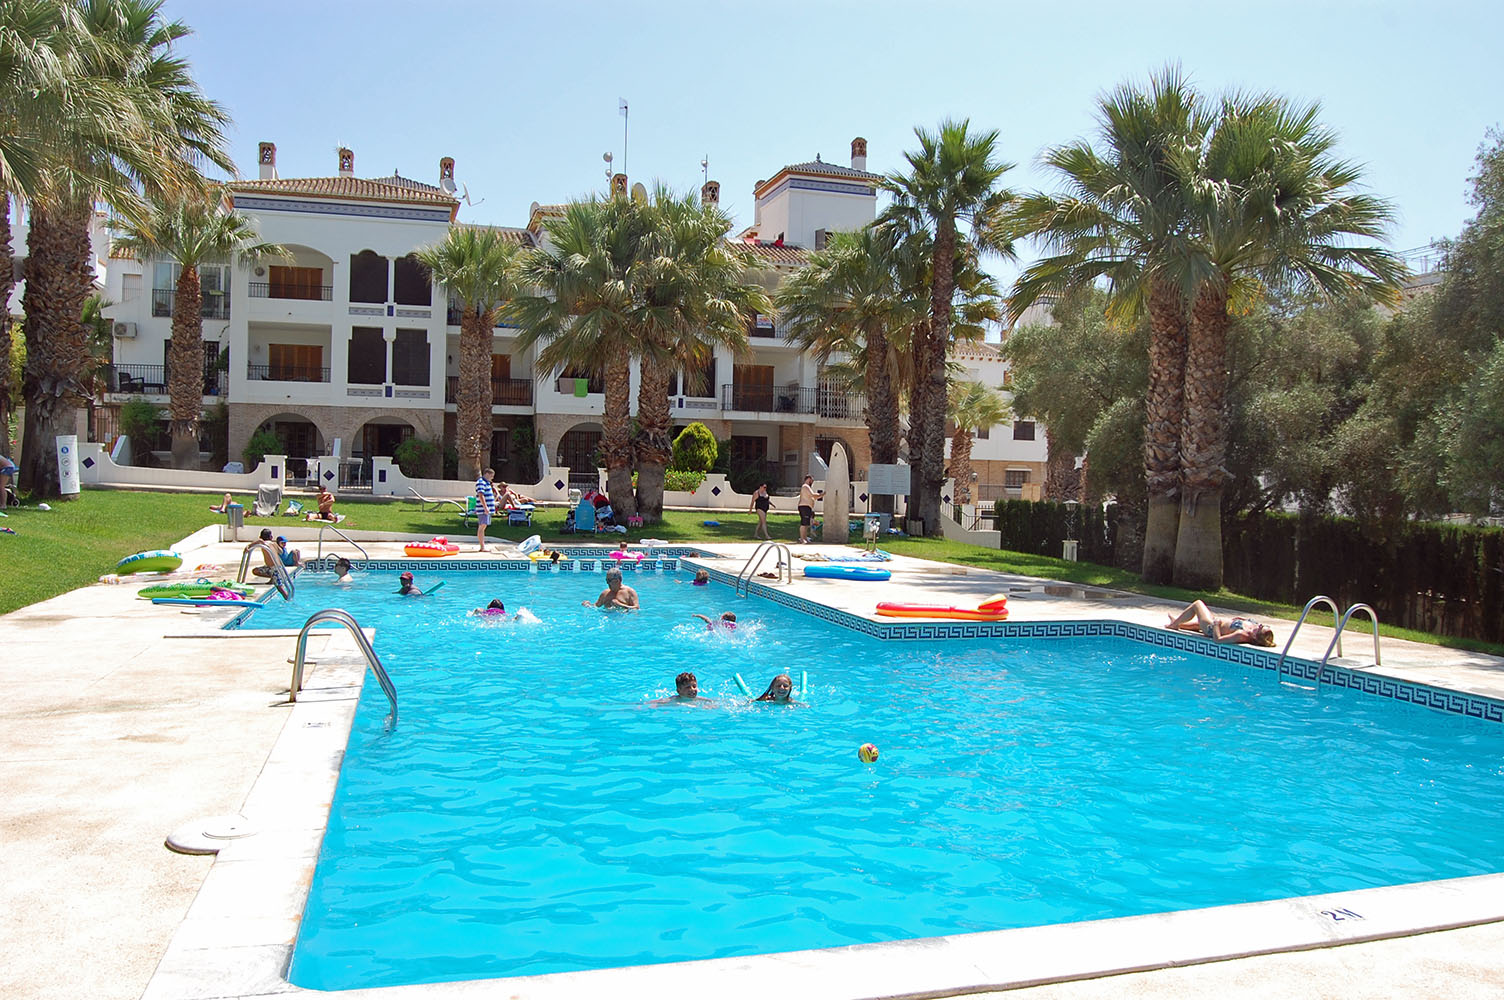 ITSH Property Communal pool for the Villamartin Plaza. 2